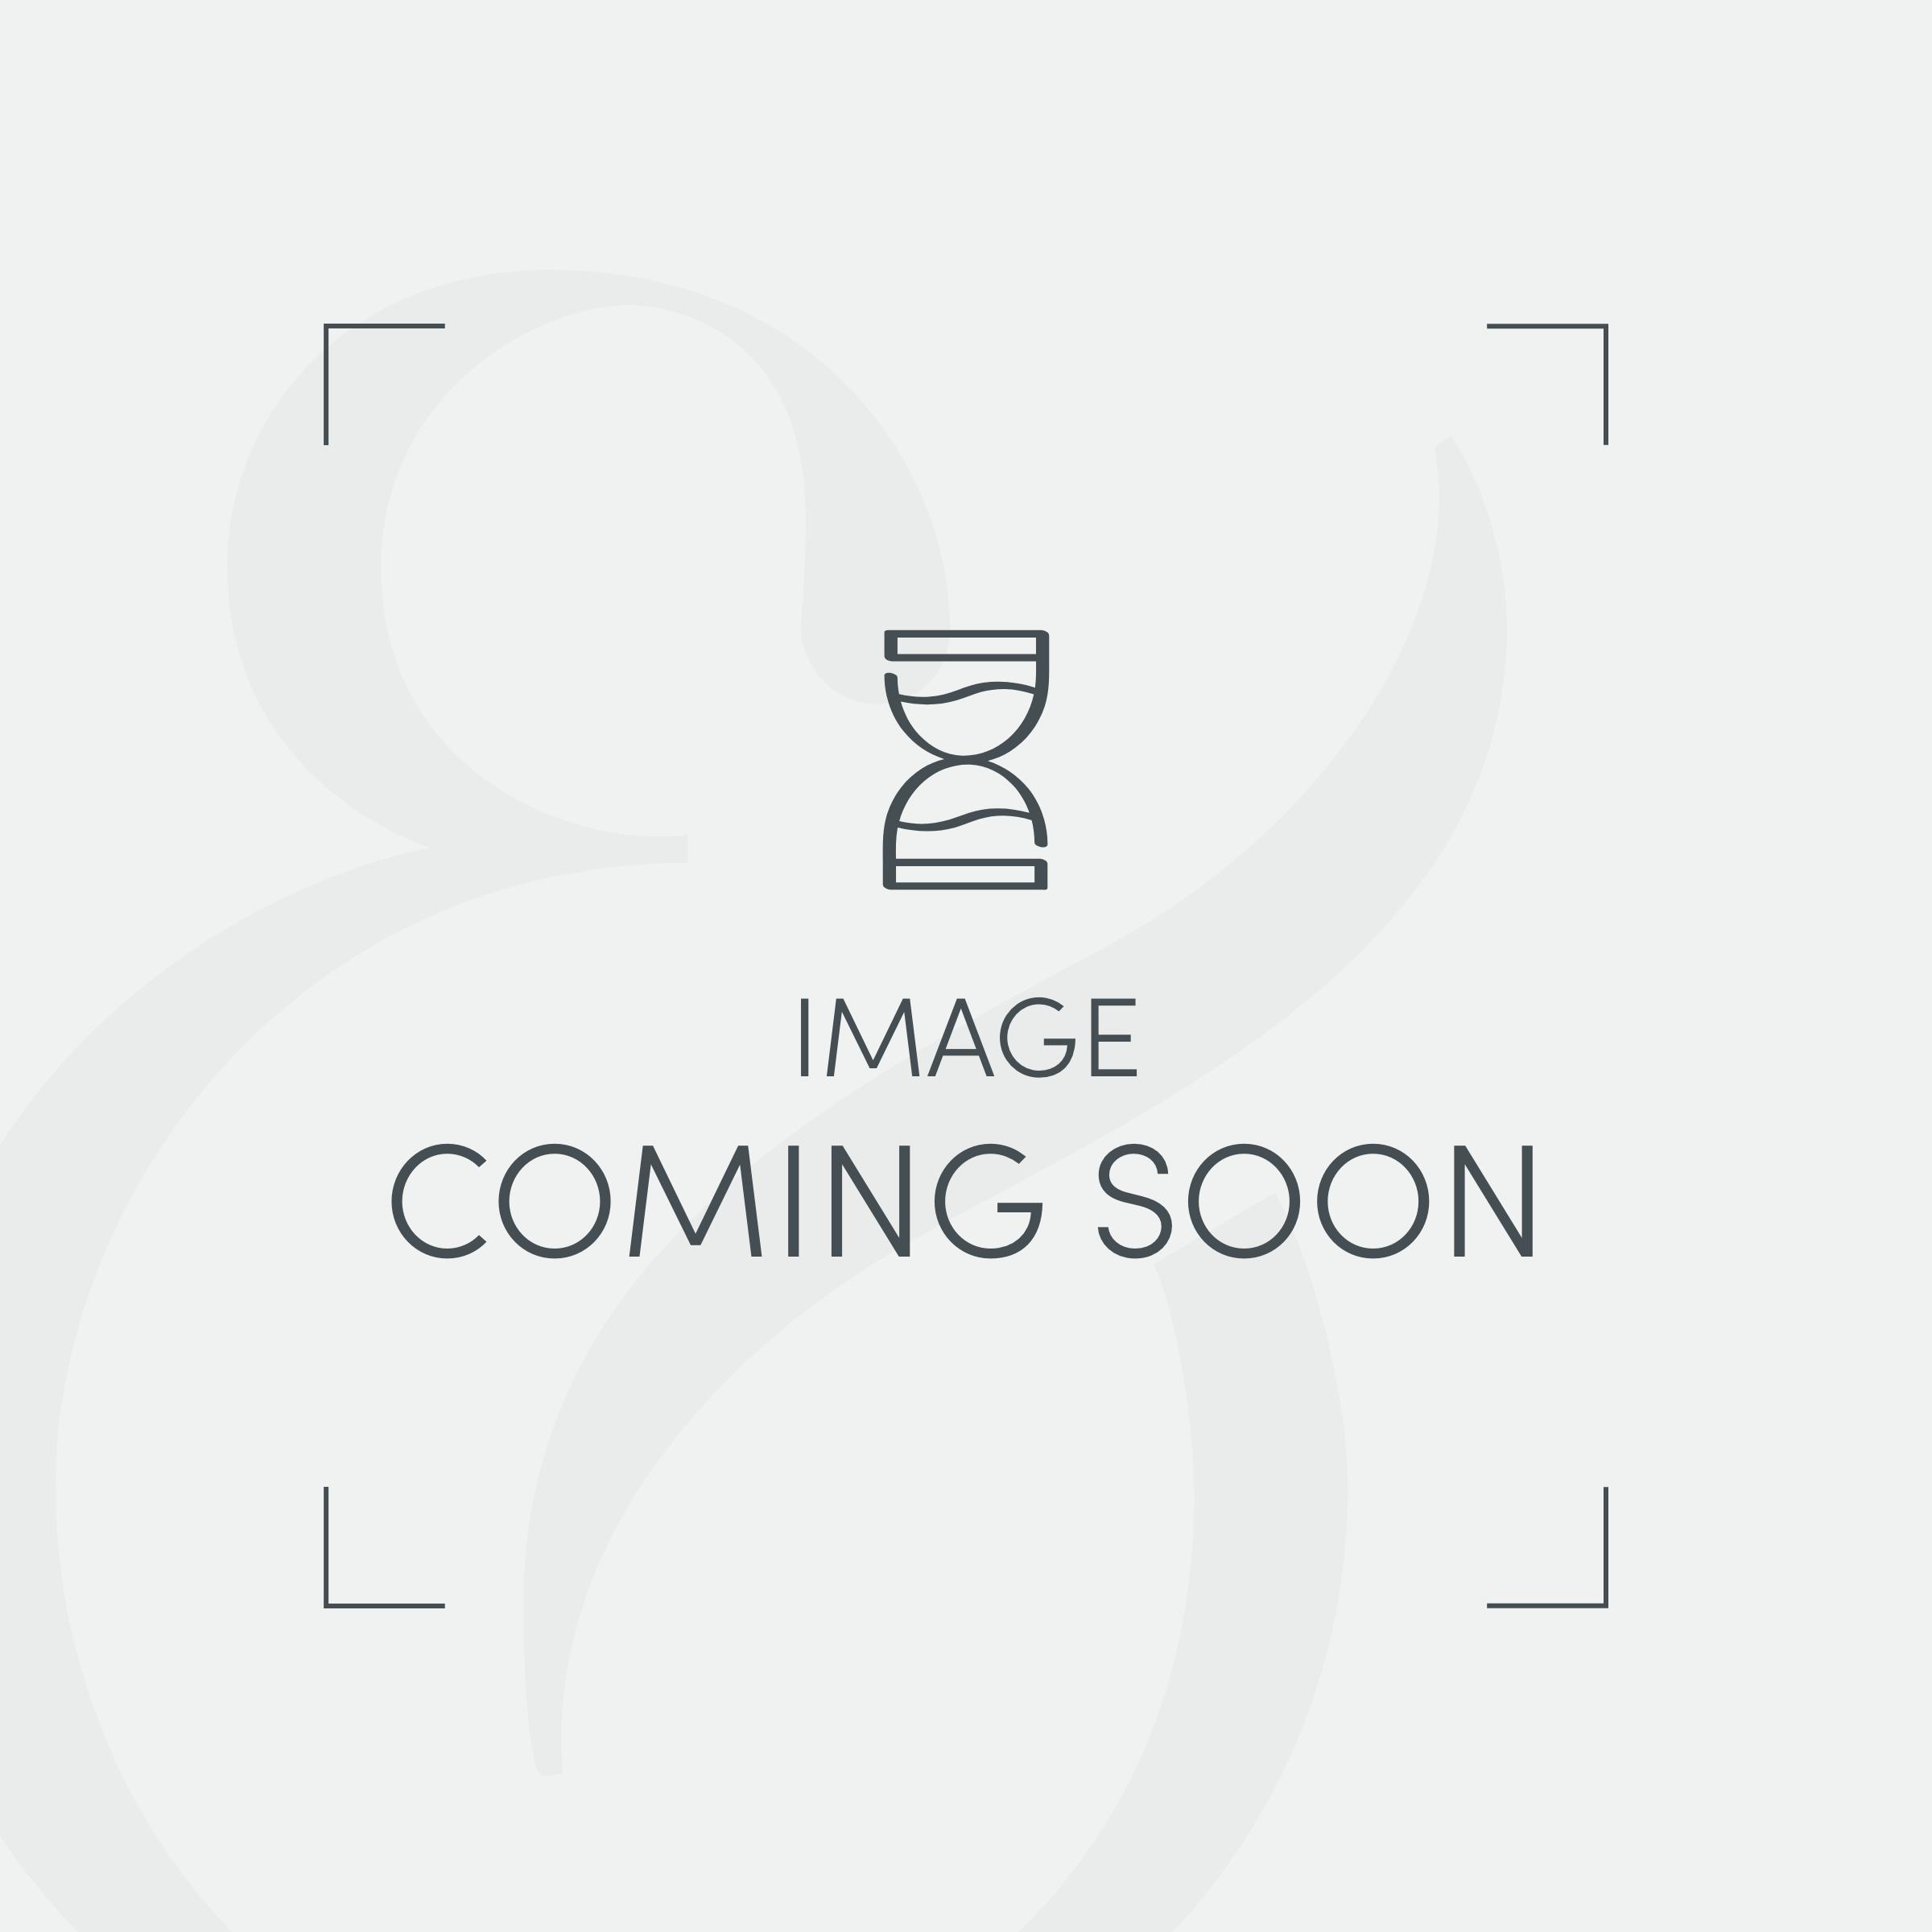 Luxury Egyptian Towel Set (2 x Face Cloths, 2 x Hand Towels, 2 x Bath Towels) - White